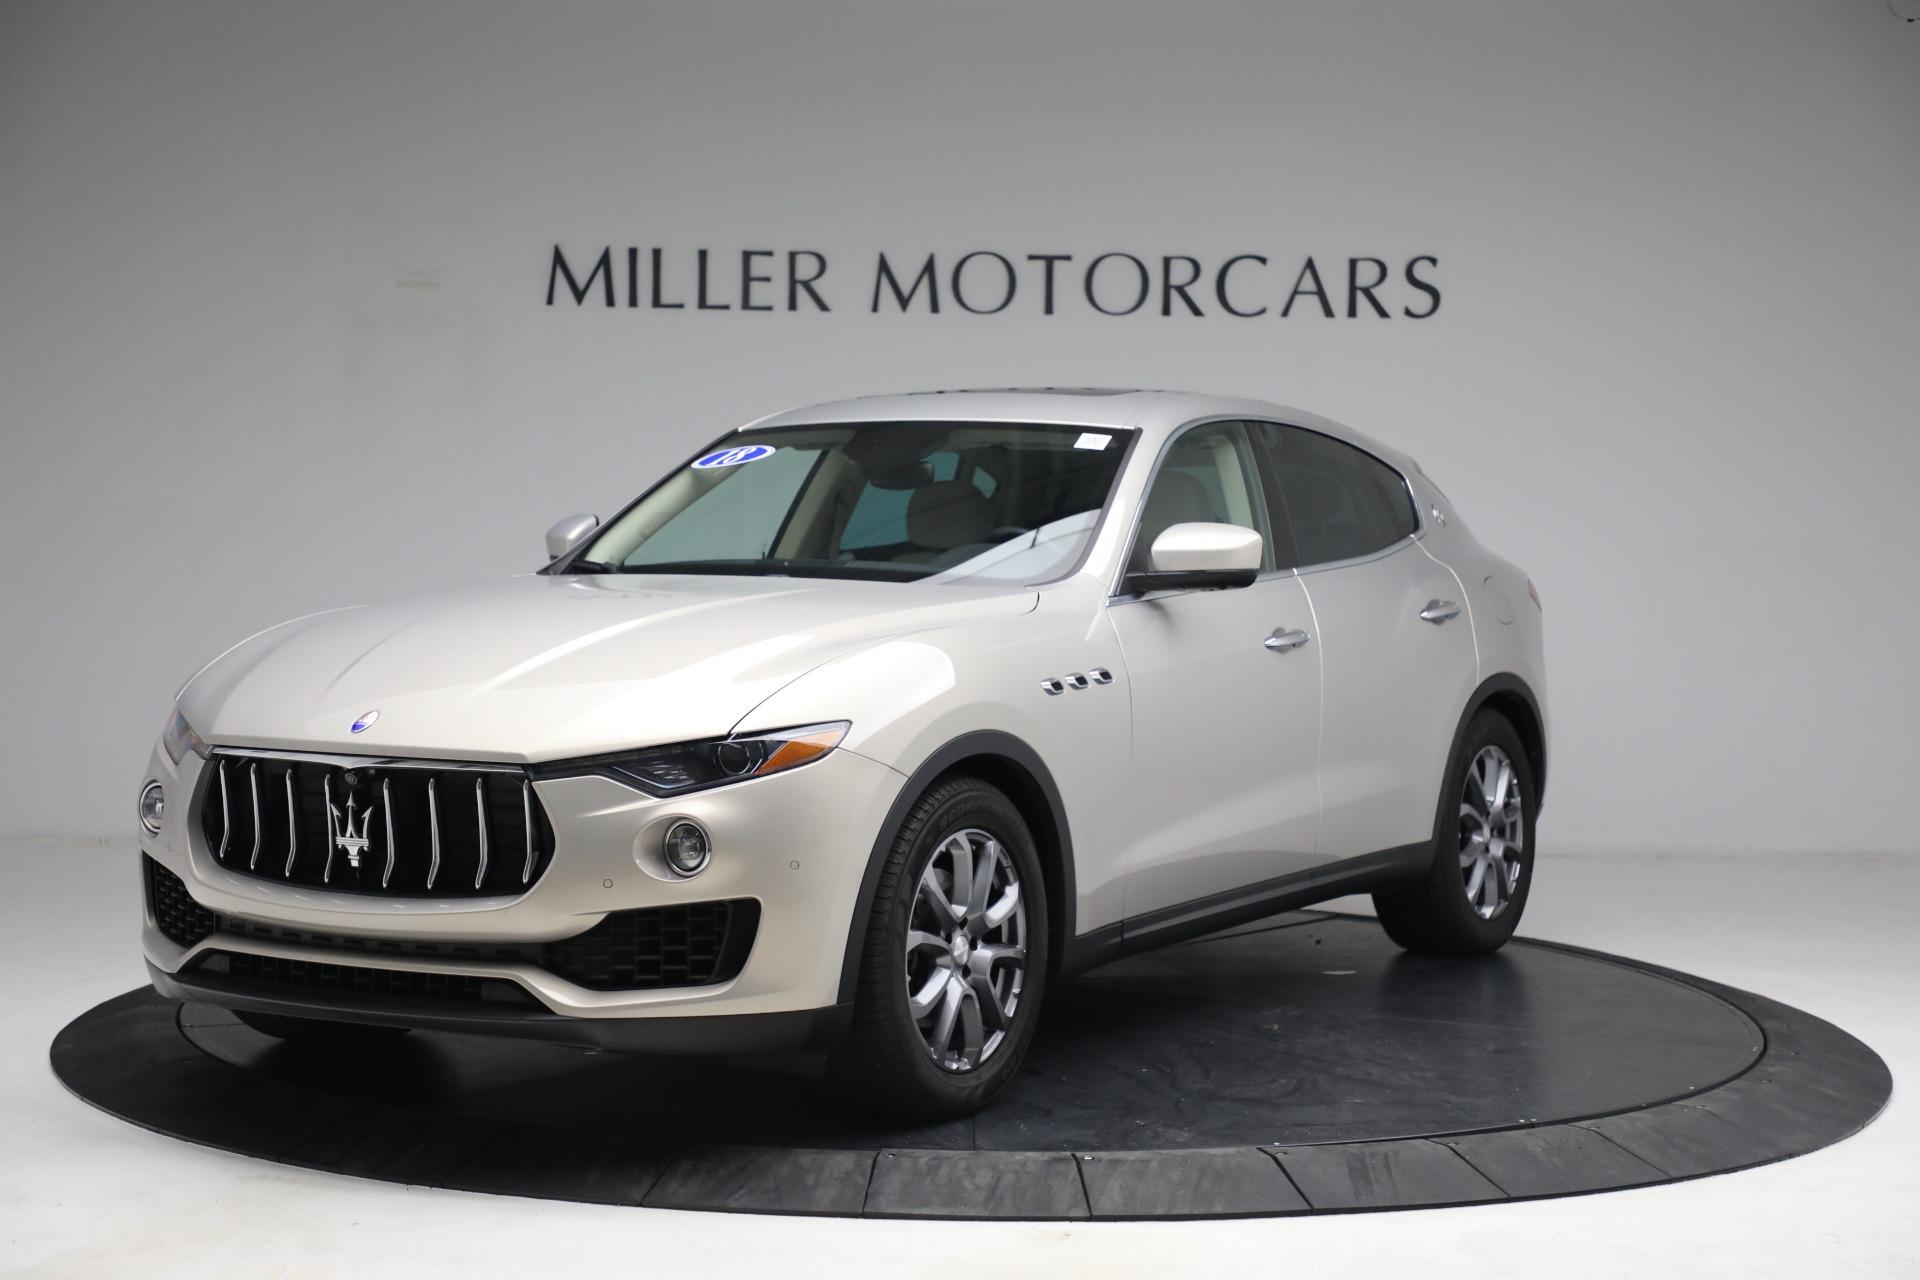 Used 2018 Maserati Levante for sale $57,900 at Aston Martin of Greenwich in Greenwich CT 06830 1